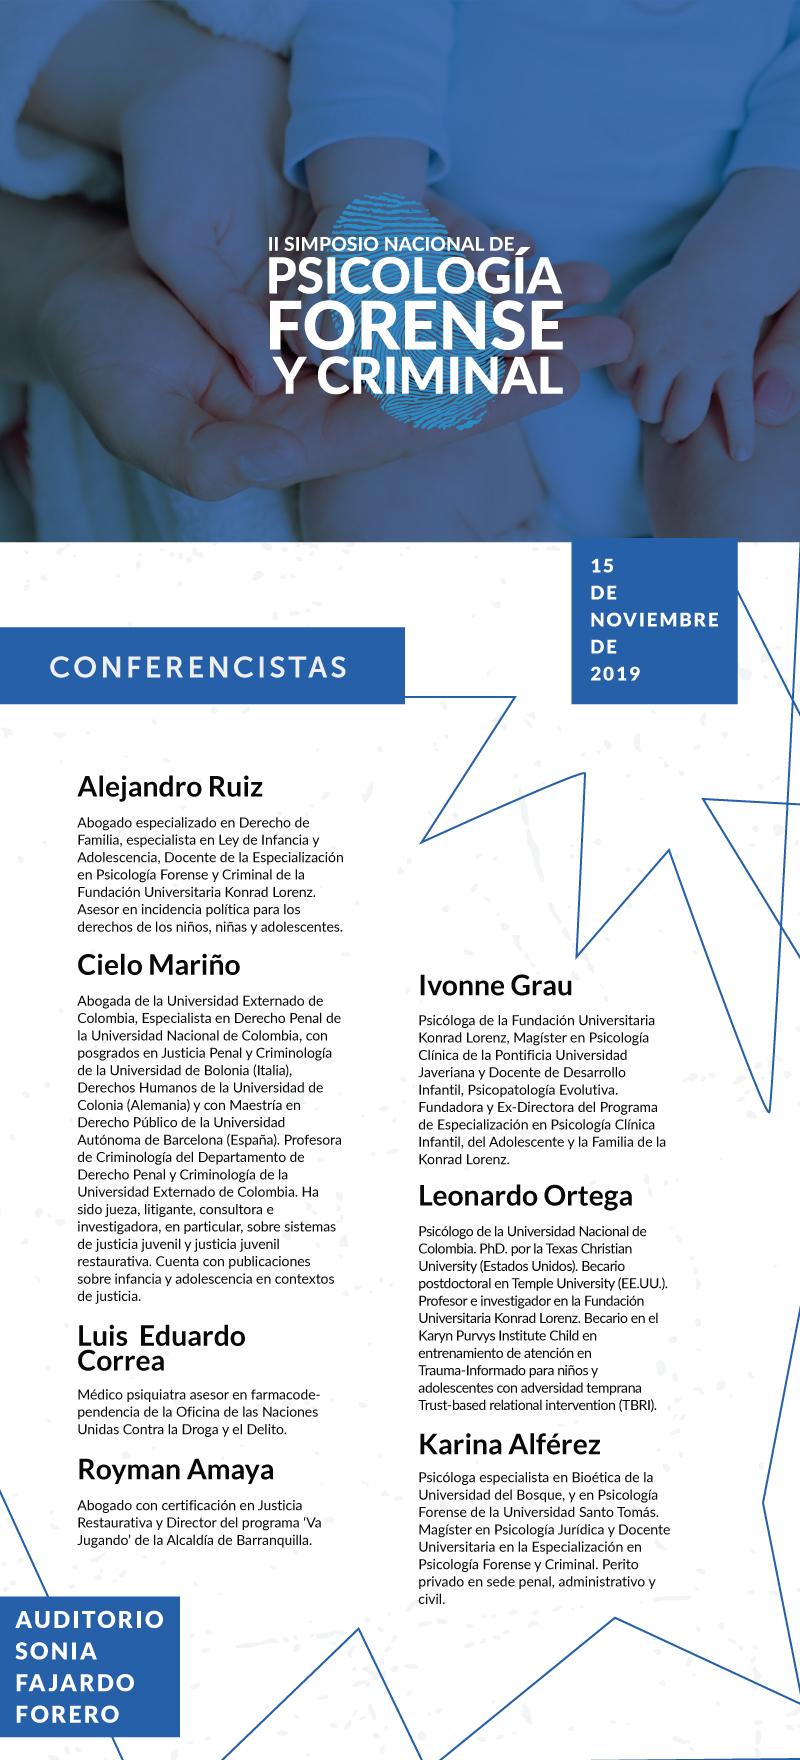 2019_AGENDA_SIMPOSIO_PSICOLOGIA_perfiles